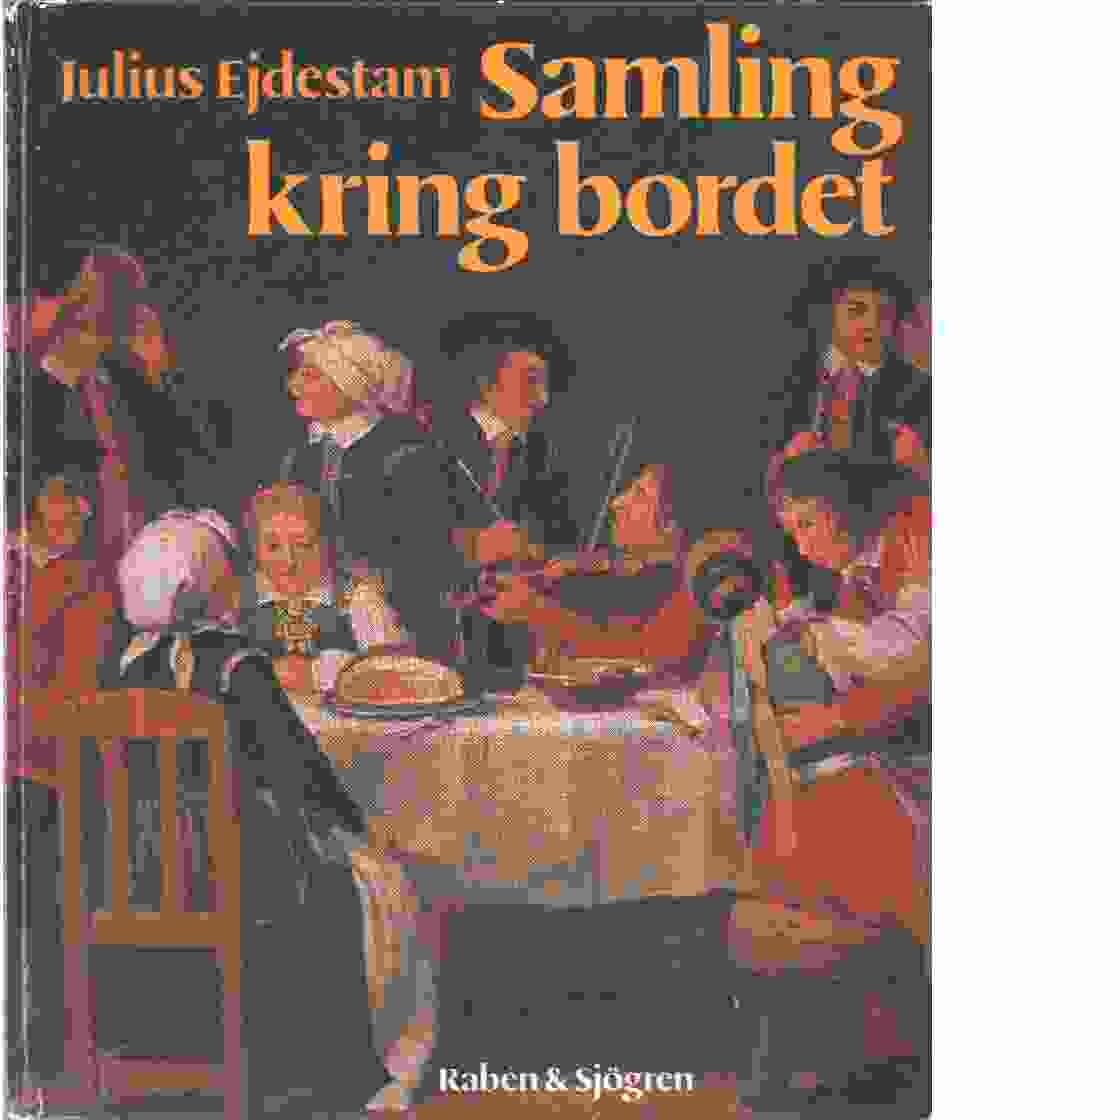 Samling kring bordet - Ejdestam, Julius